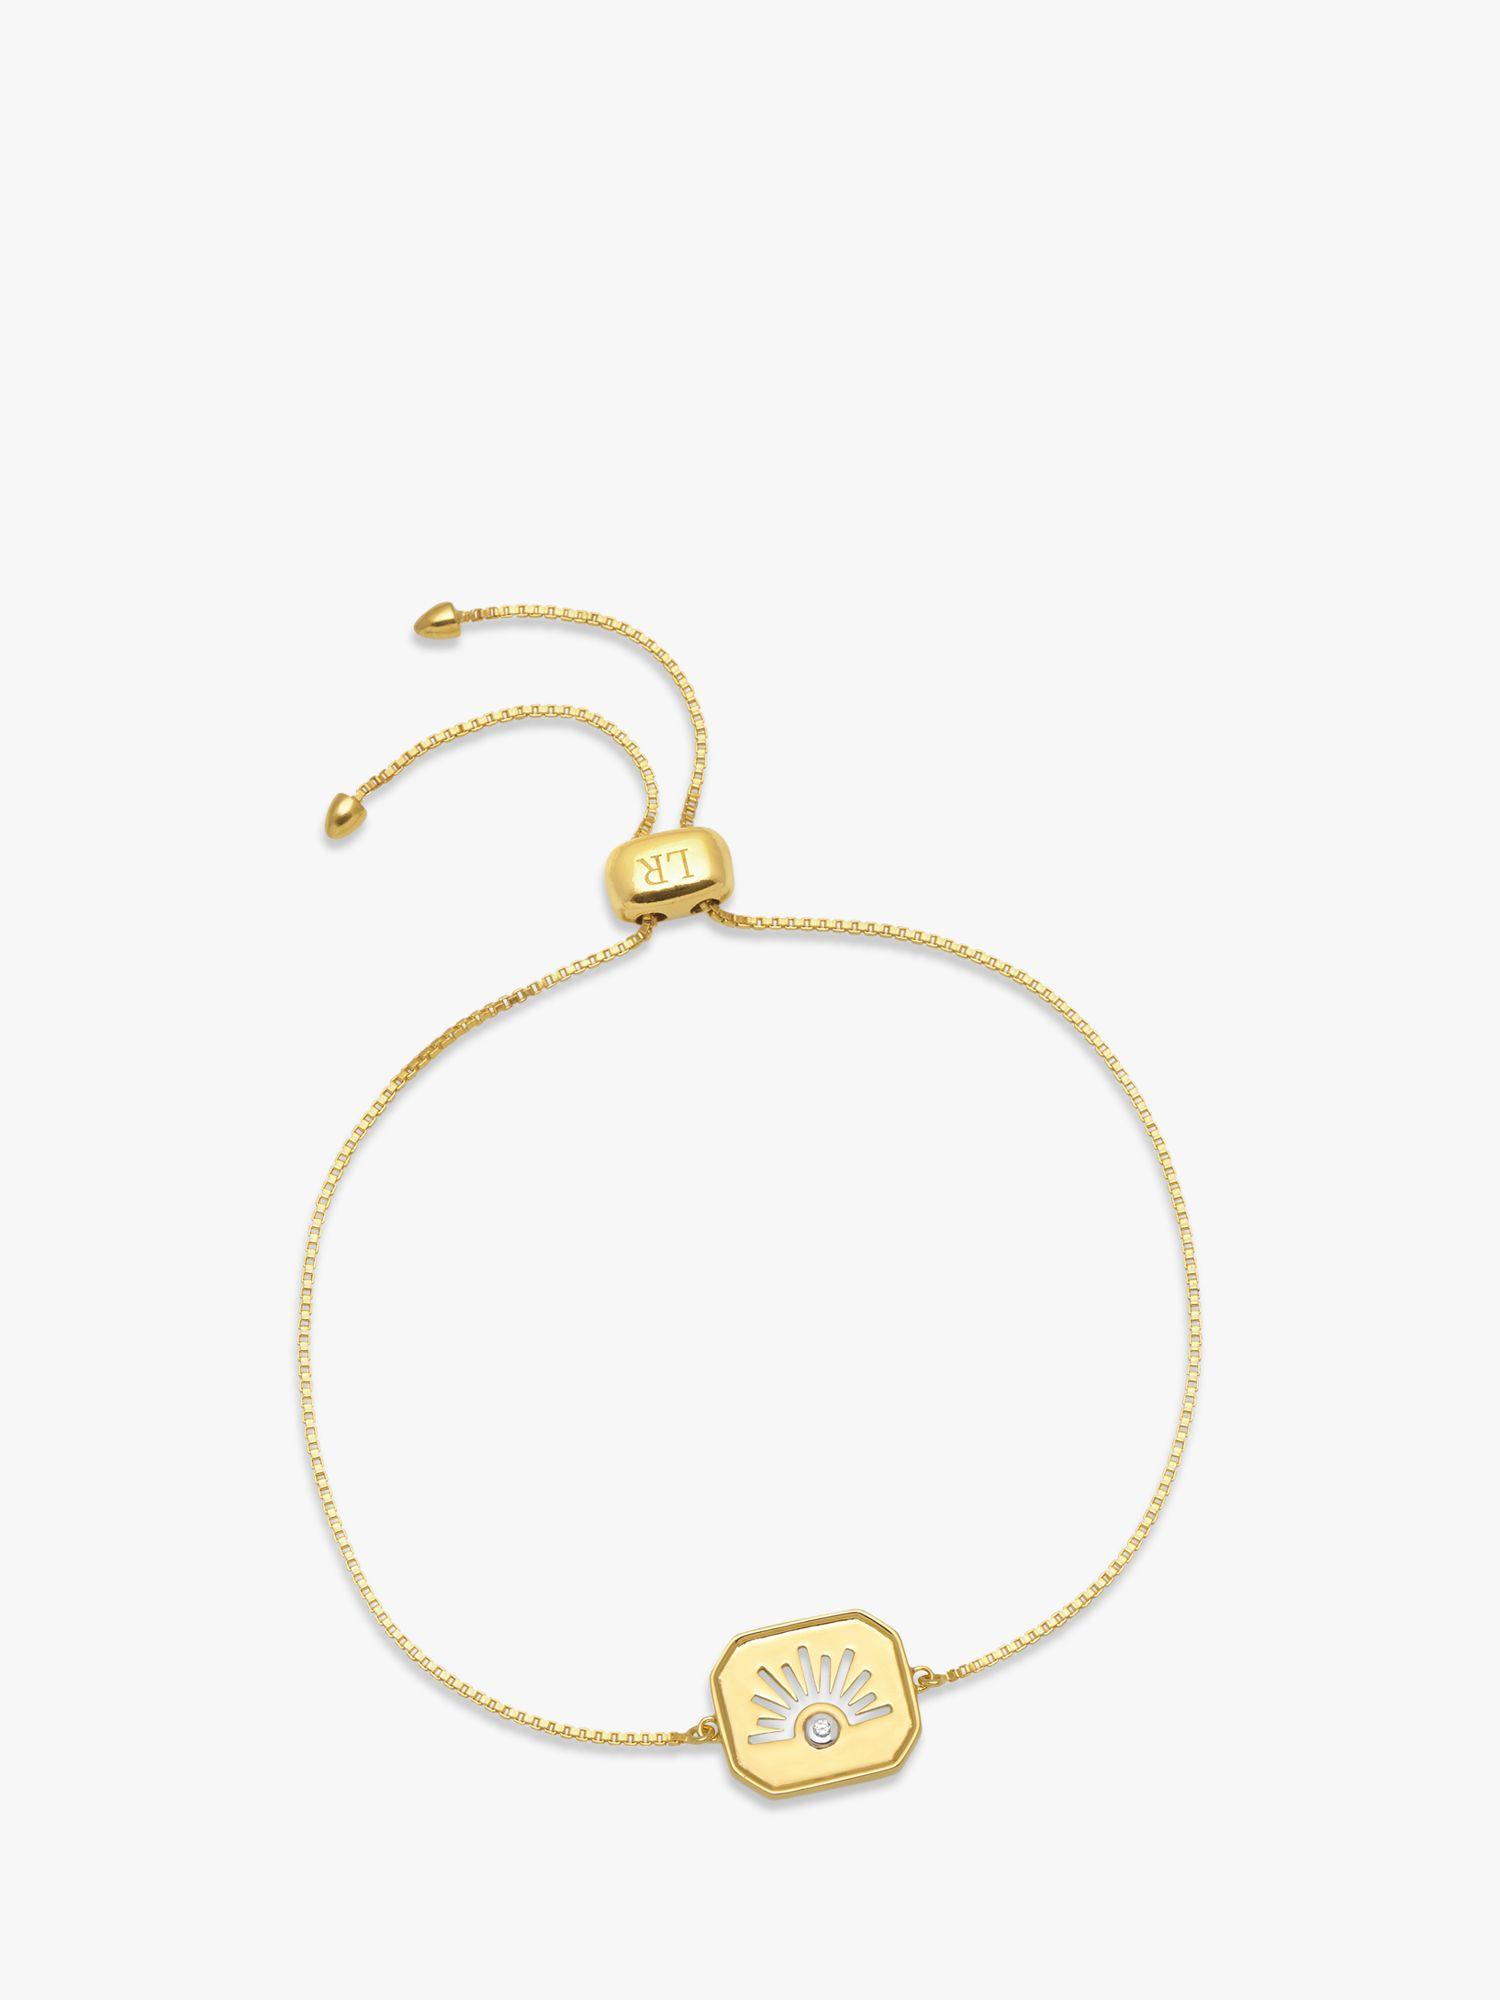 Lola Rose Lola Rose Curio Celestial Zircon Slider Chain Bracelet, Gold